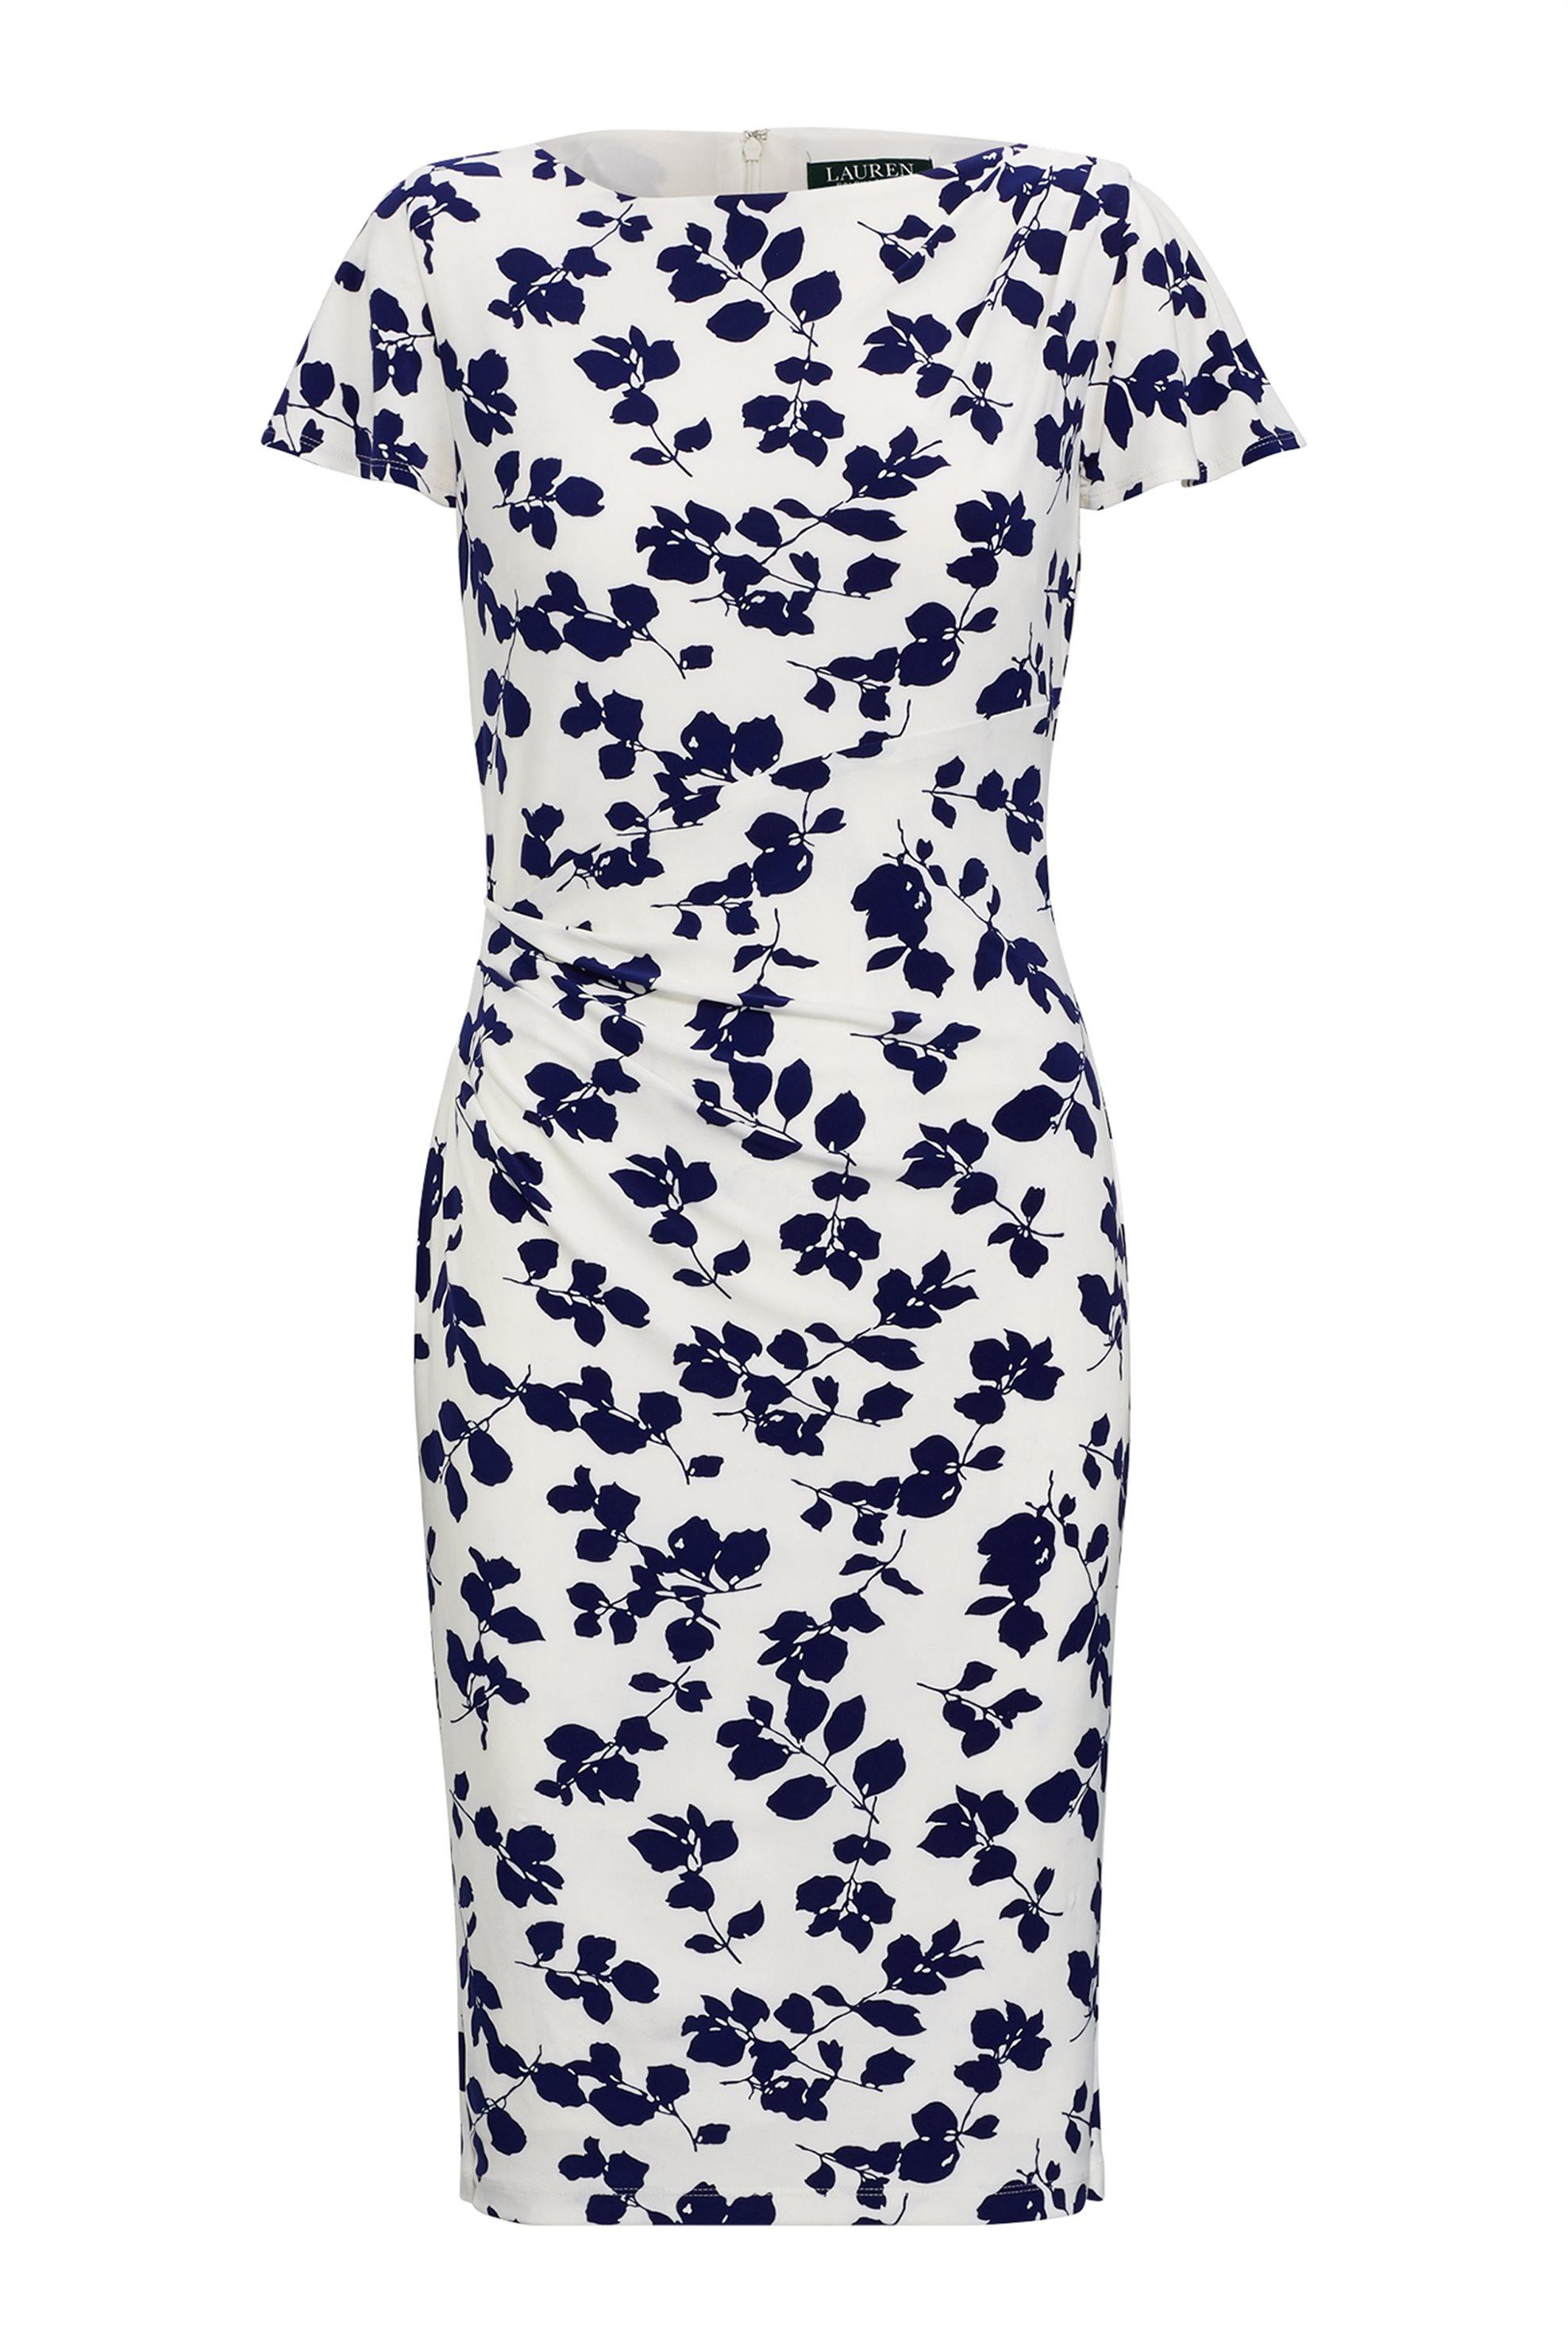 Lauren Ralph Lauren γυναικείo floral φόρεμα με σούρες - 250731371001 - Λευκό γυναικα   ρουχα   φορέματα   midi φορέματα